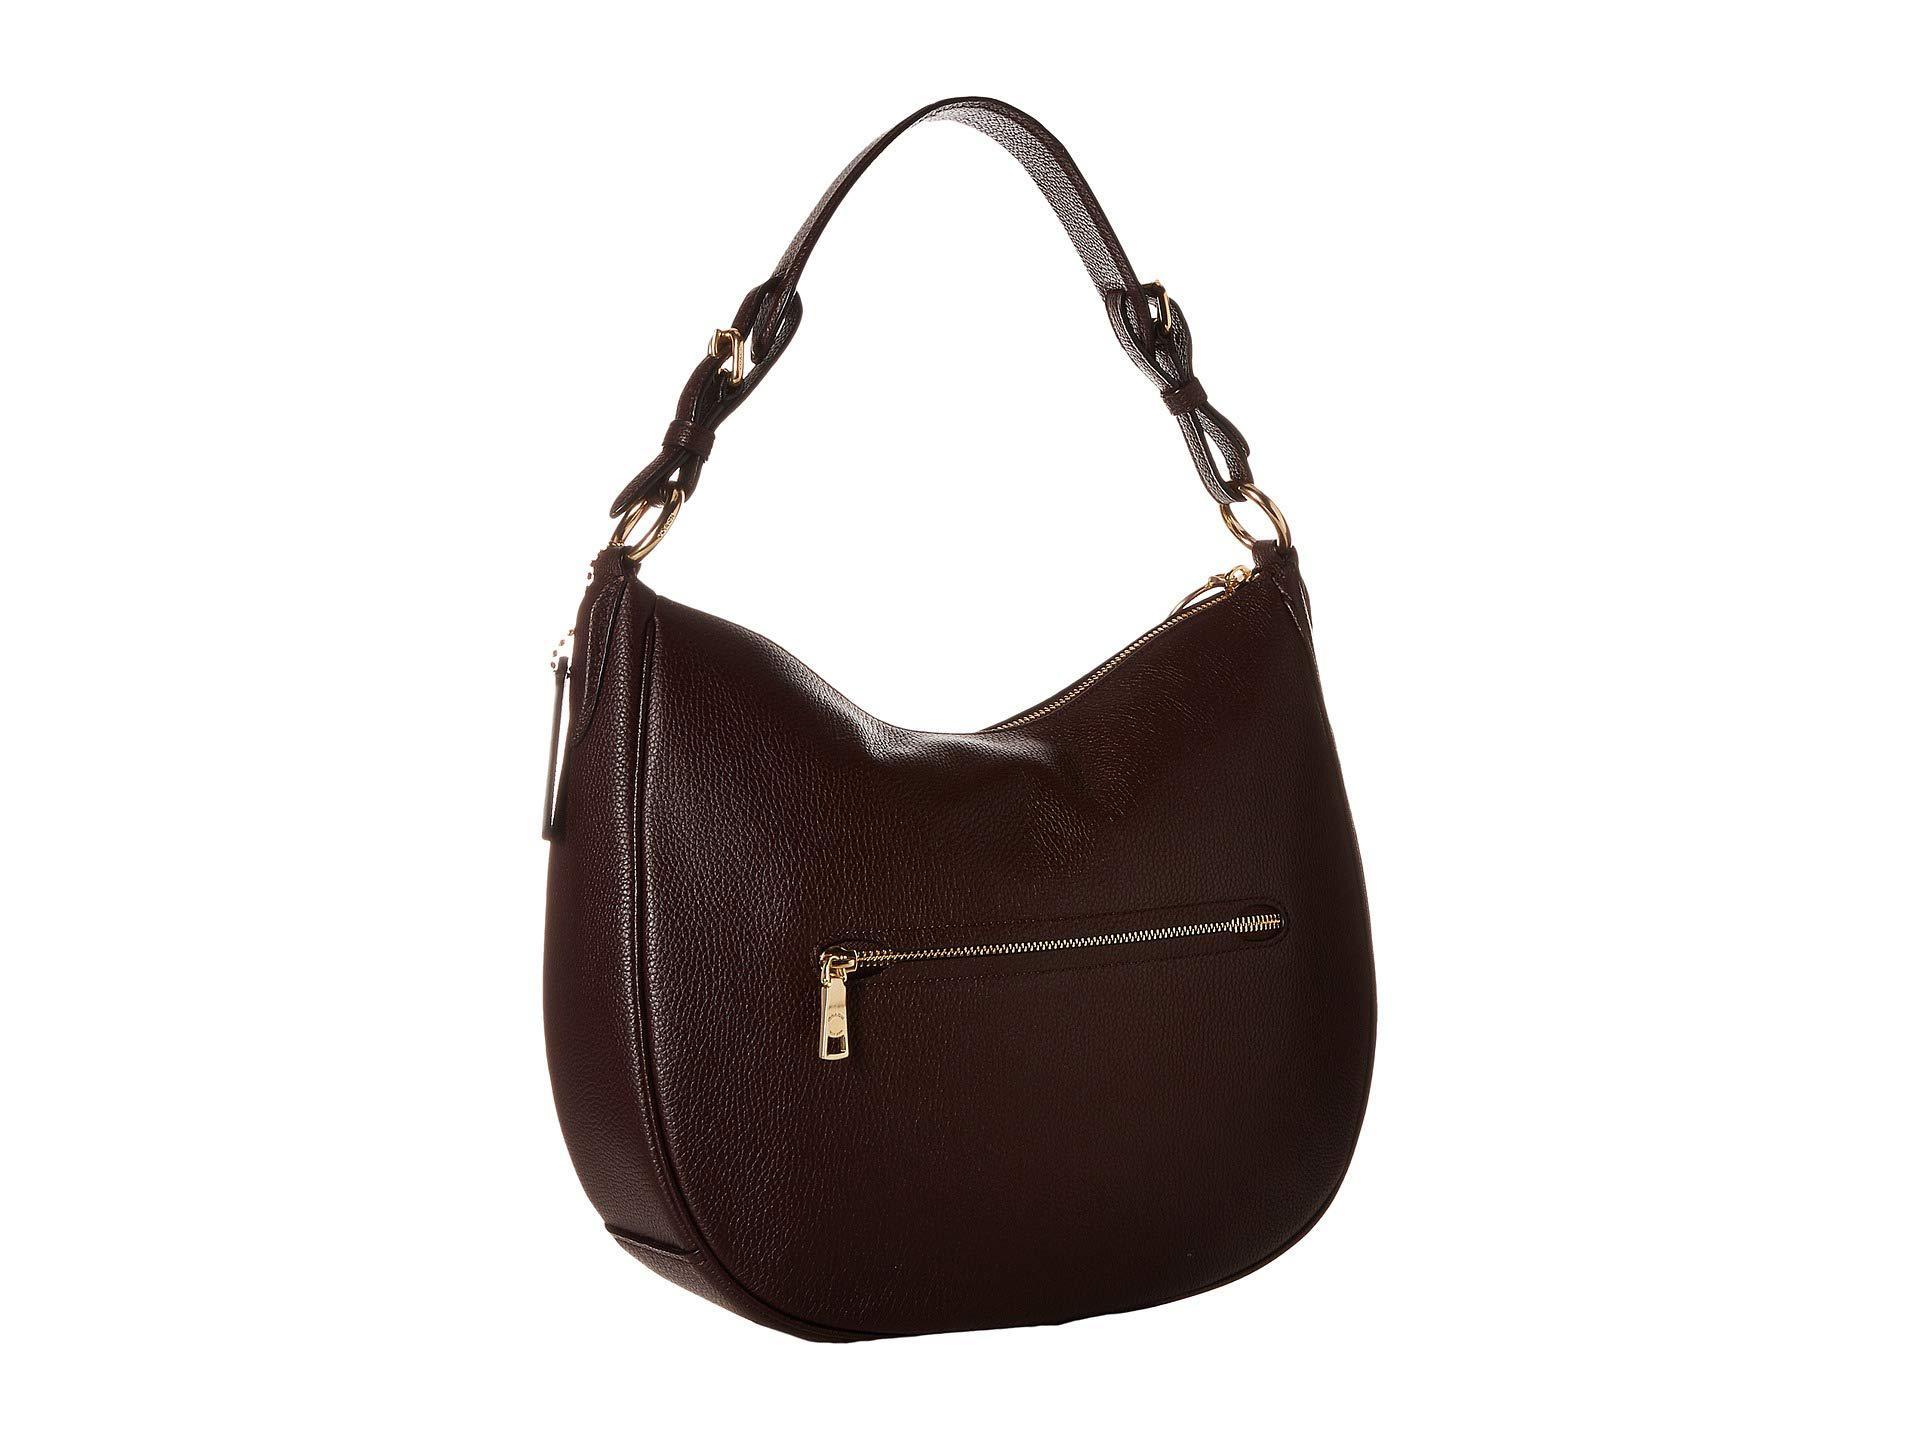 8b11221101 COACH Polished Pebble Leather Sutton Hobo (gold/oxblood) Hobo ...